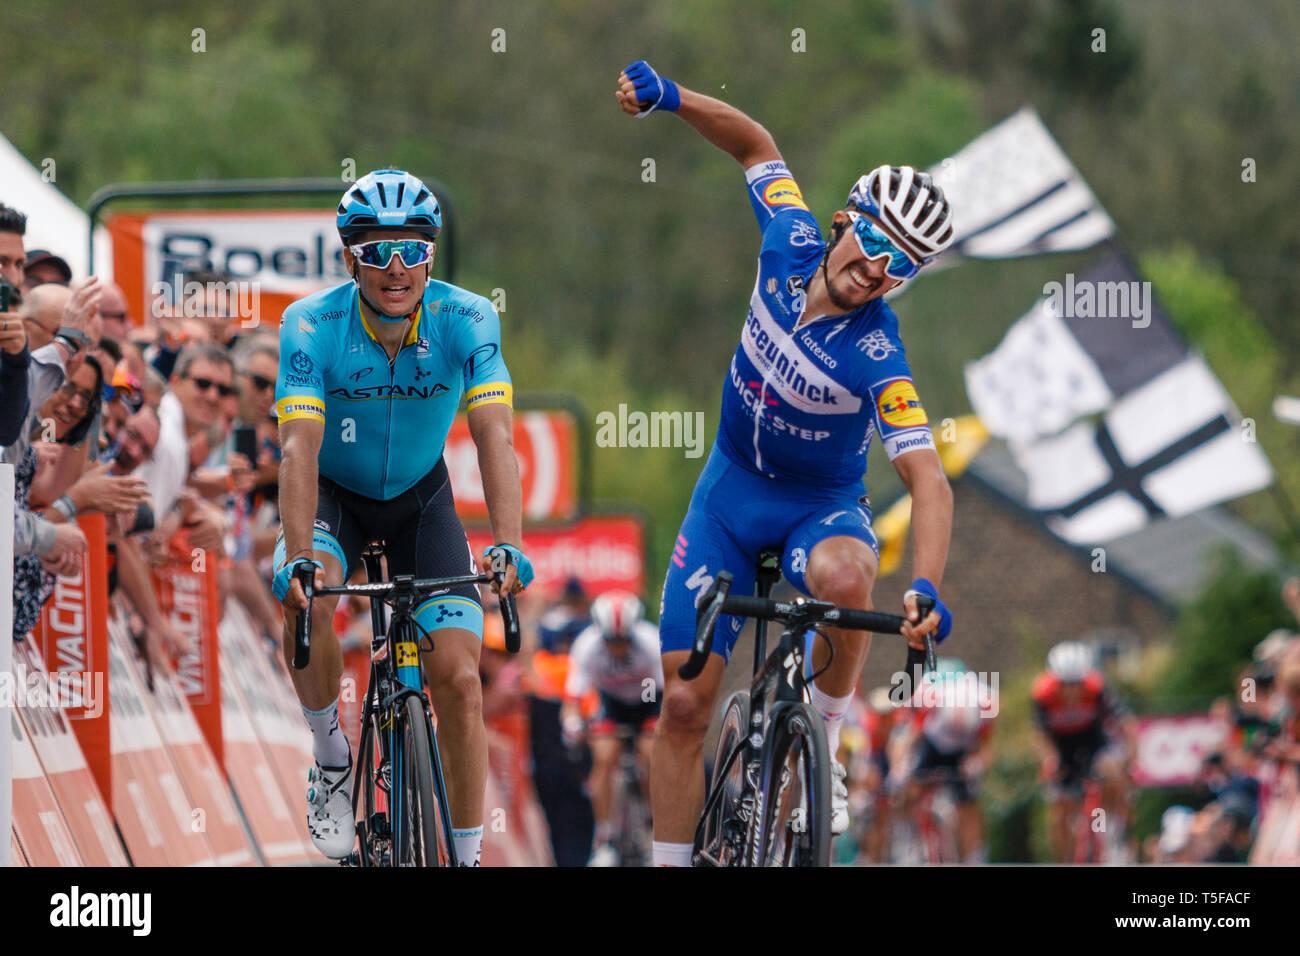 24 april 2019 Huy, Belgium Cycling La Fleche Wallone    Julien Alaphilipe winaar Waalse Pijl mannen wint de Waalse Pijl Stock Photo